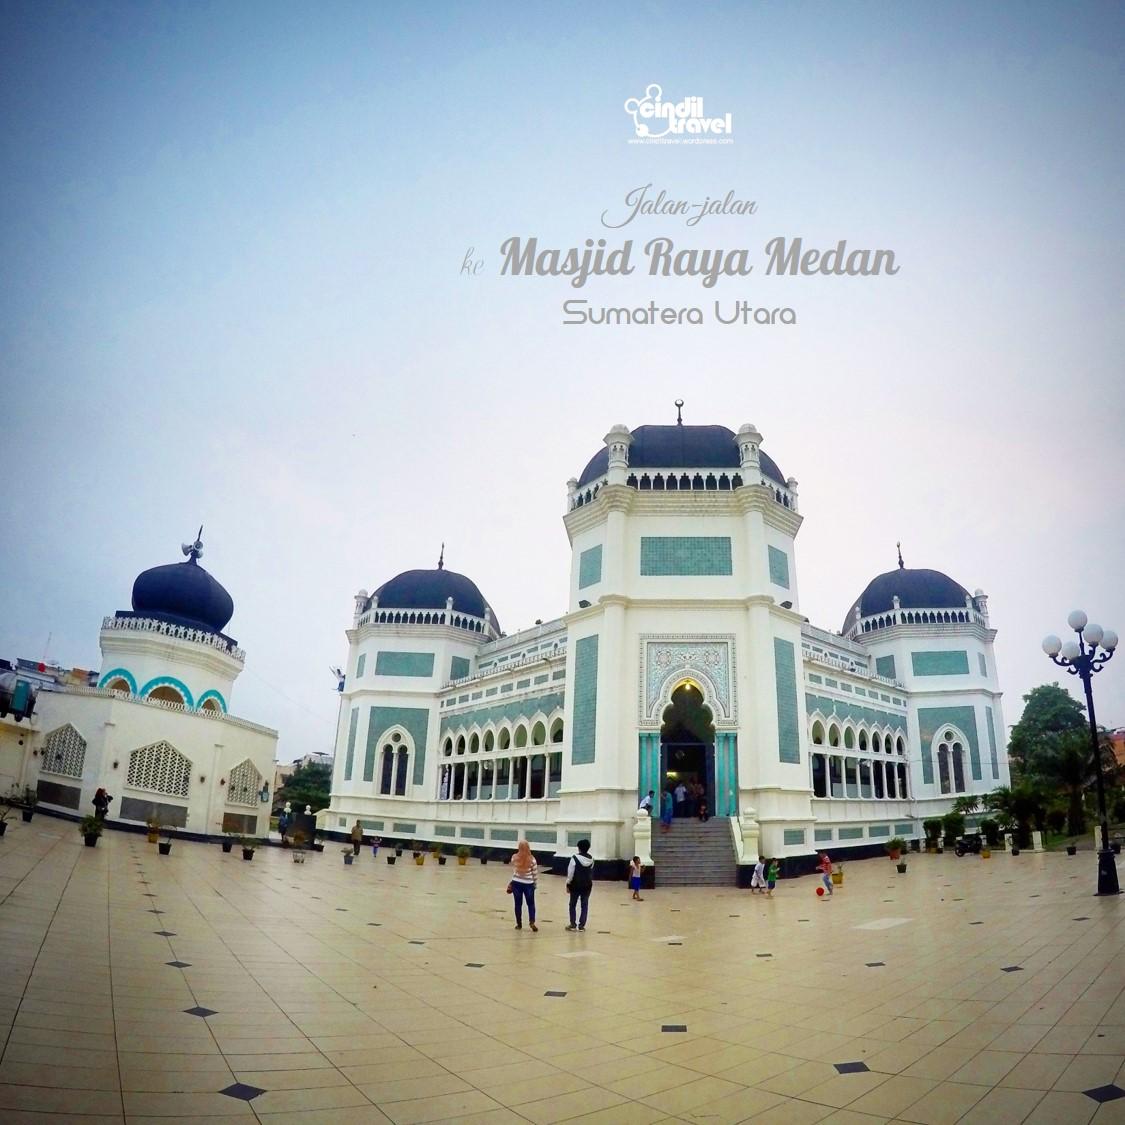 Jalan Masjid Raya Medan Cindiltravelcindiltravel Cindiltravel 1 Kota